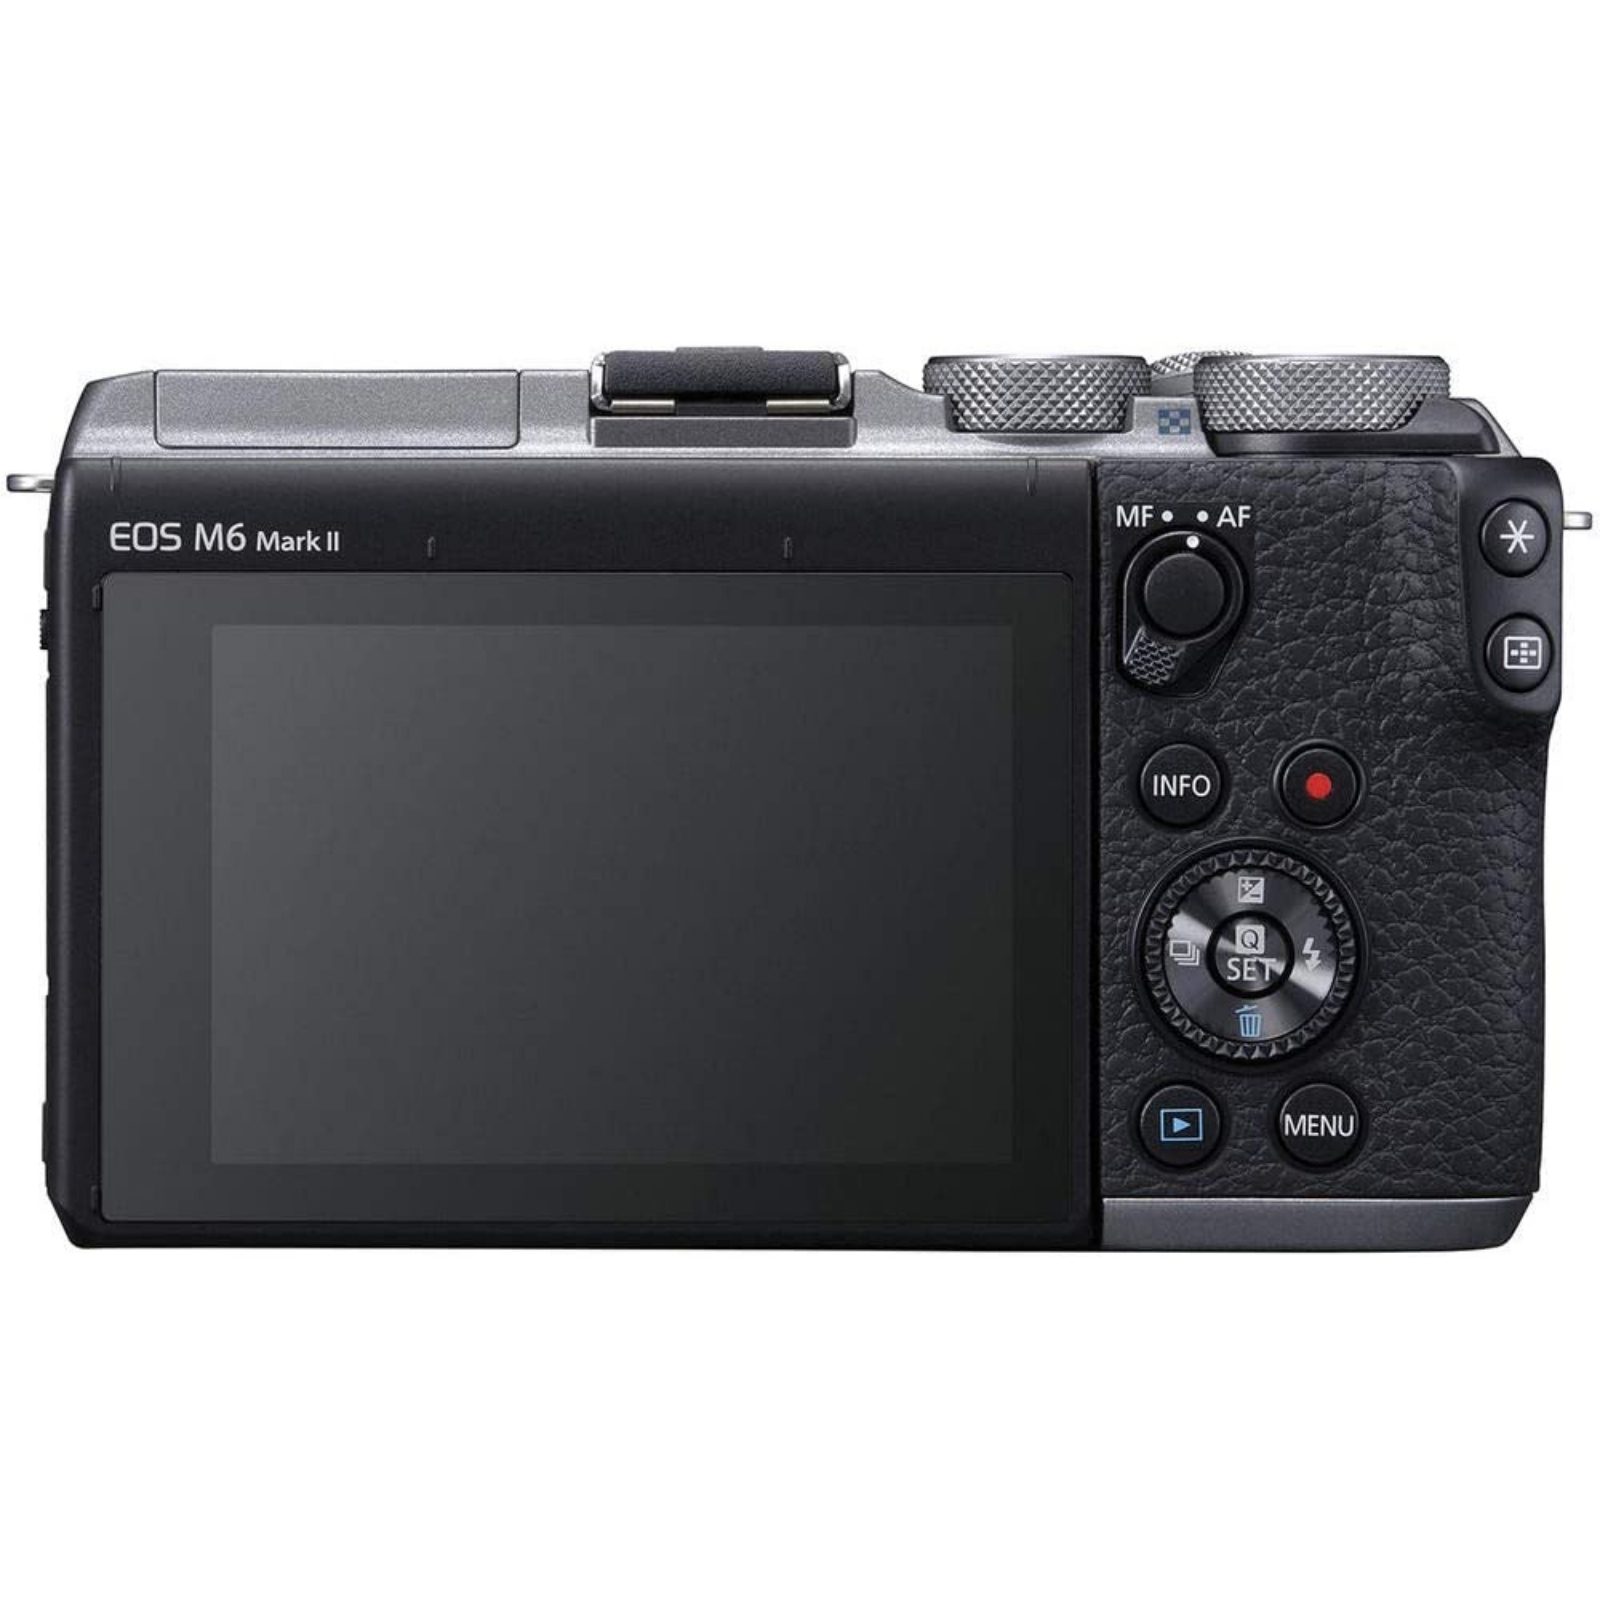 Canon キヤノン ミラーレス一眼カメラ EOS M6 Mark II ボディー シルバー 新品